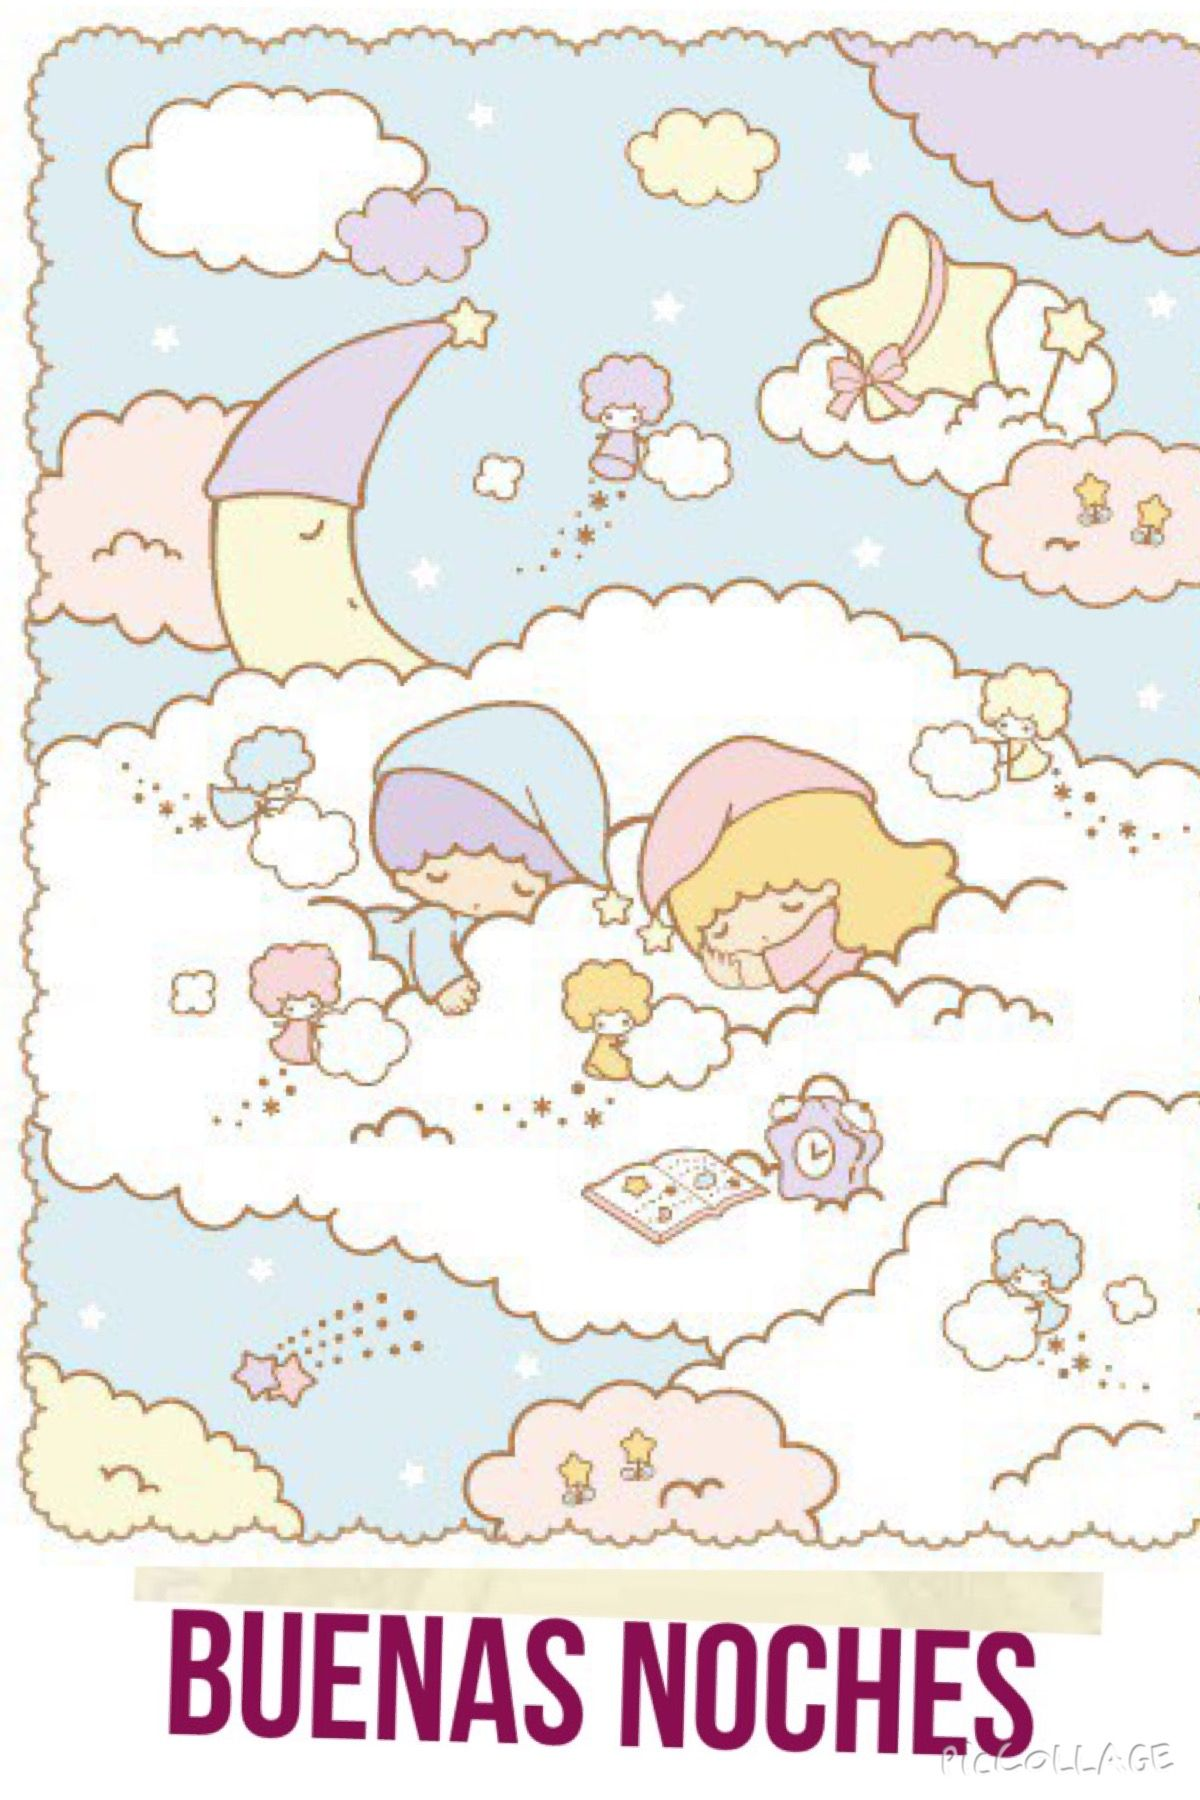 """Good Night"", as courtesy of Sanrio"